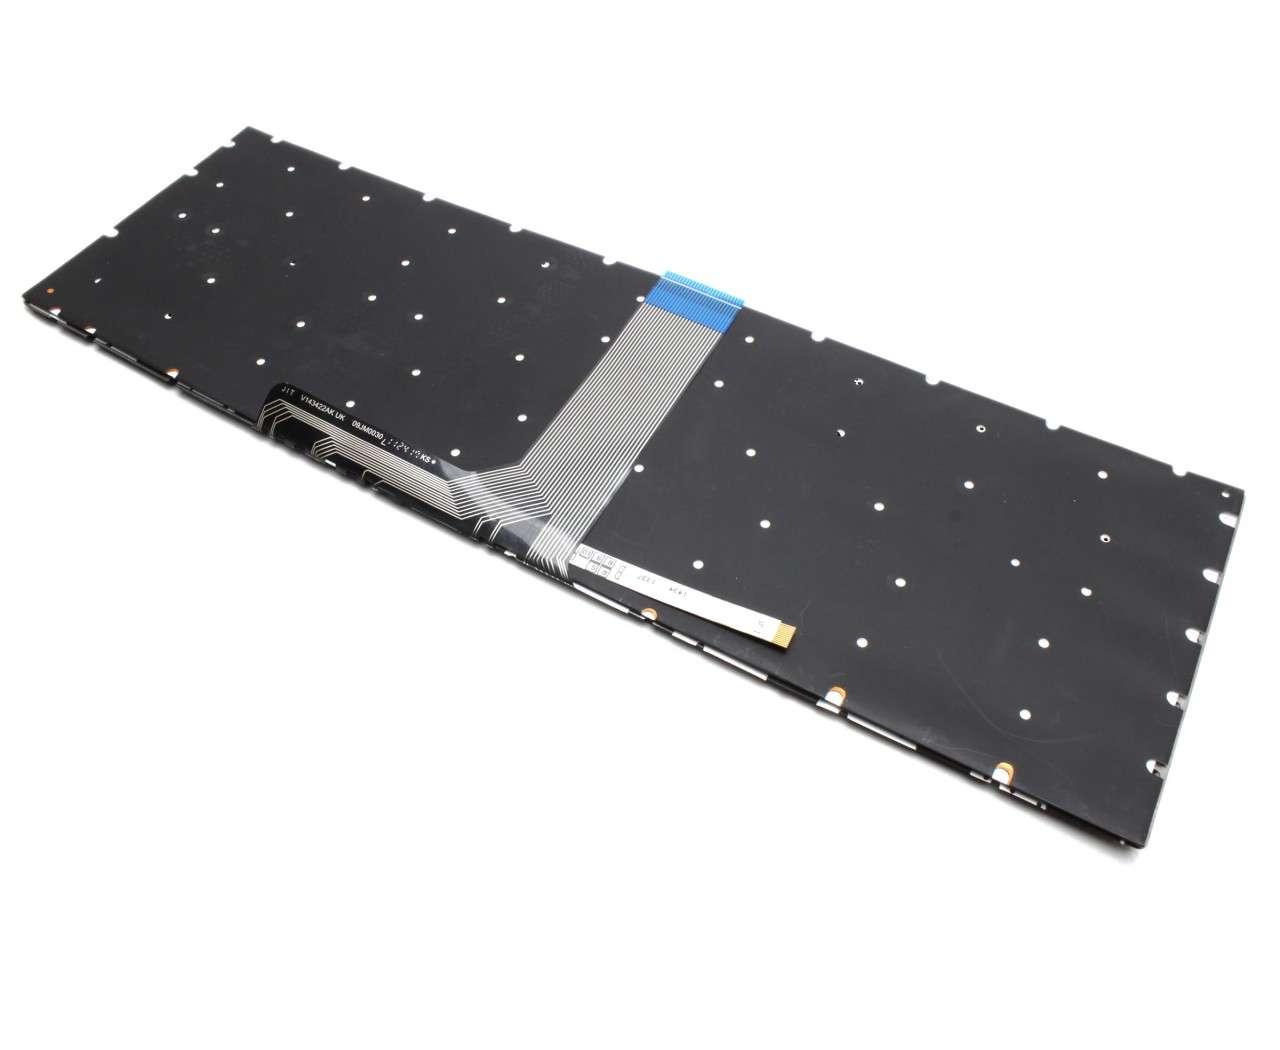 Tastatura MSI GS70 2QE Stealth Pro iluminata backlit imagine powerlaptop.ro 2021